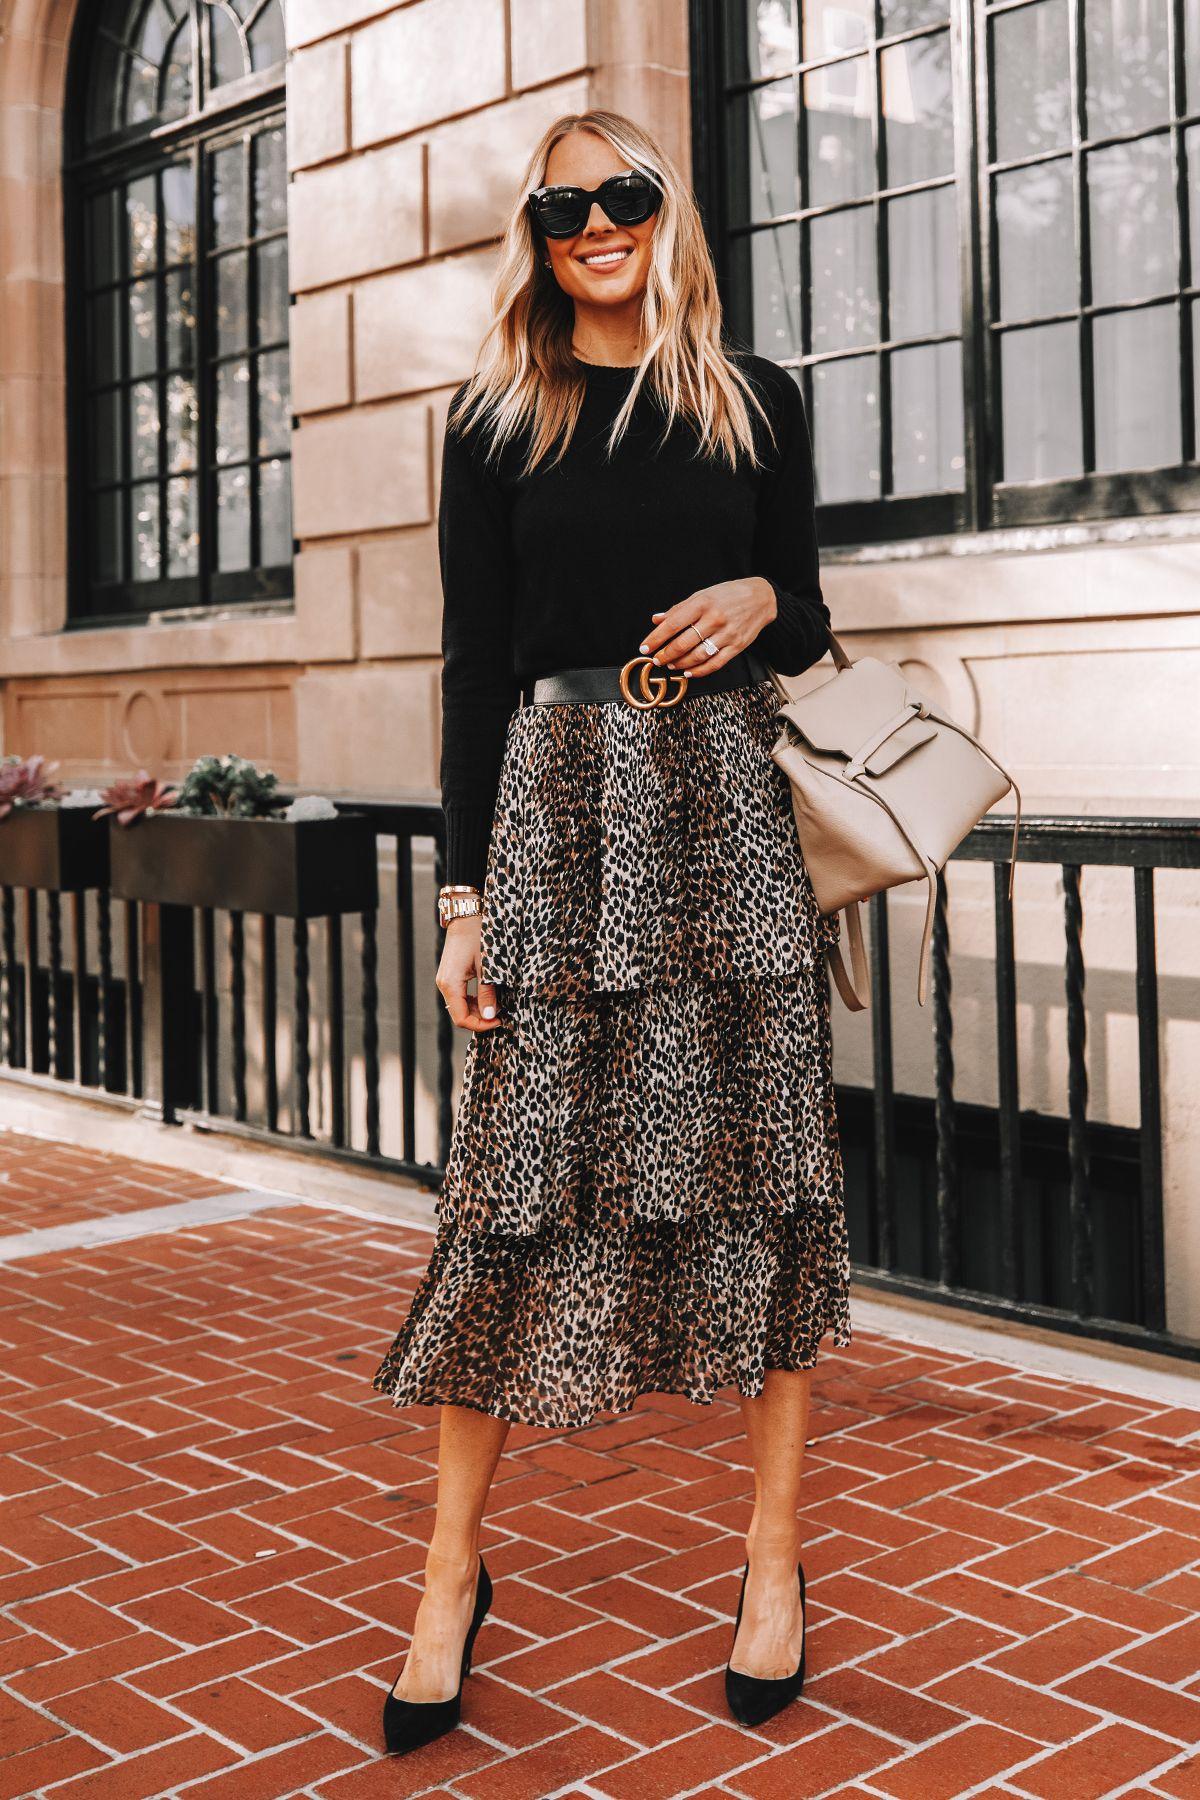 Fashion Jackson Wearing Black Sweater Topshop Leopard Midi Skirt Gucci Belt Black Pumps Workwear Outfit Fashion Jackson Fashion Maxi Skirt Outfits [ 1800 x 1200 Pixel ]